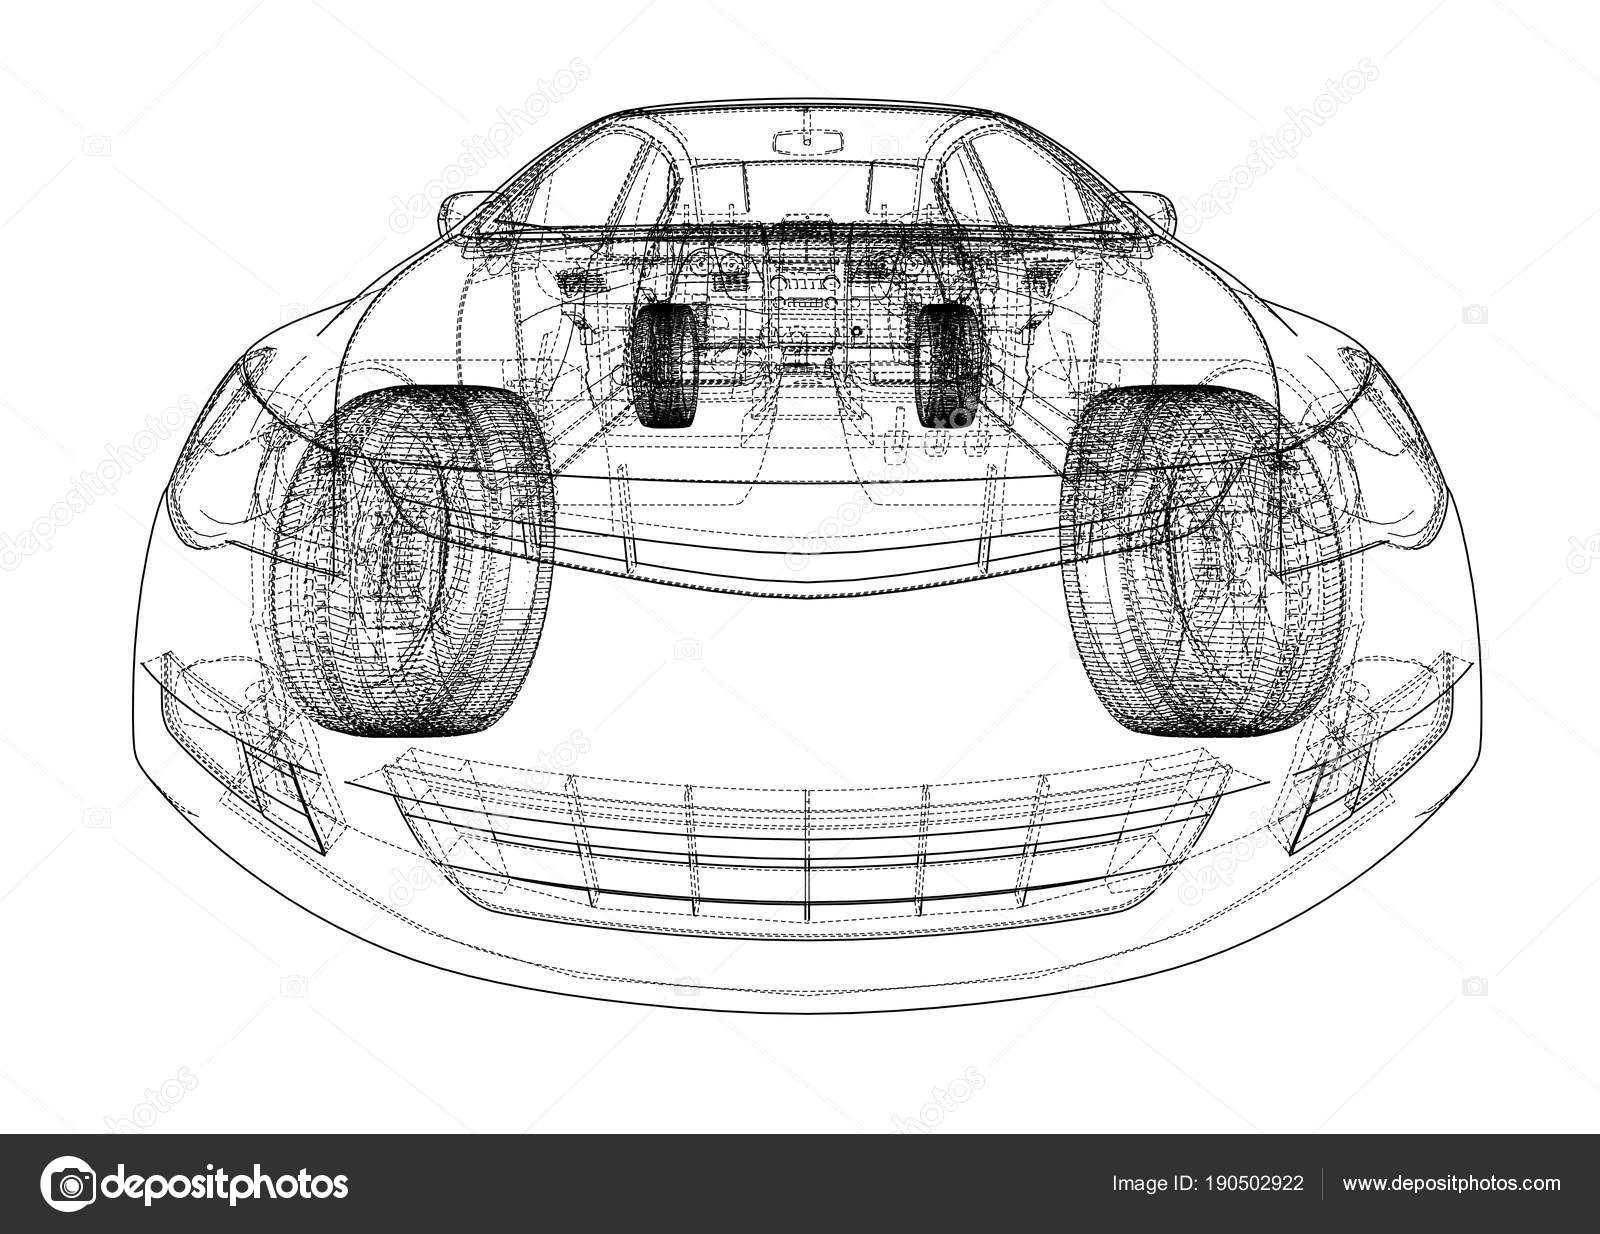 Concept car blueprint stock photo cherezoff 190502922 concept car blueprint stock photo malvernweather Images